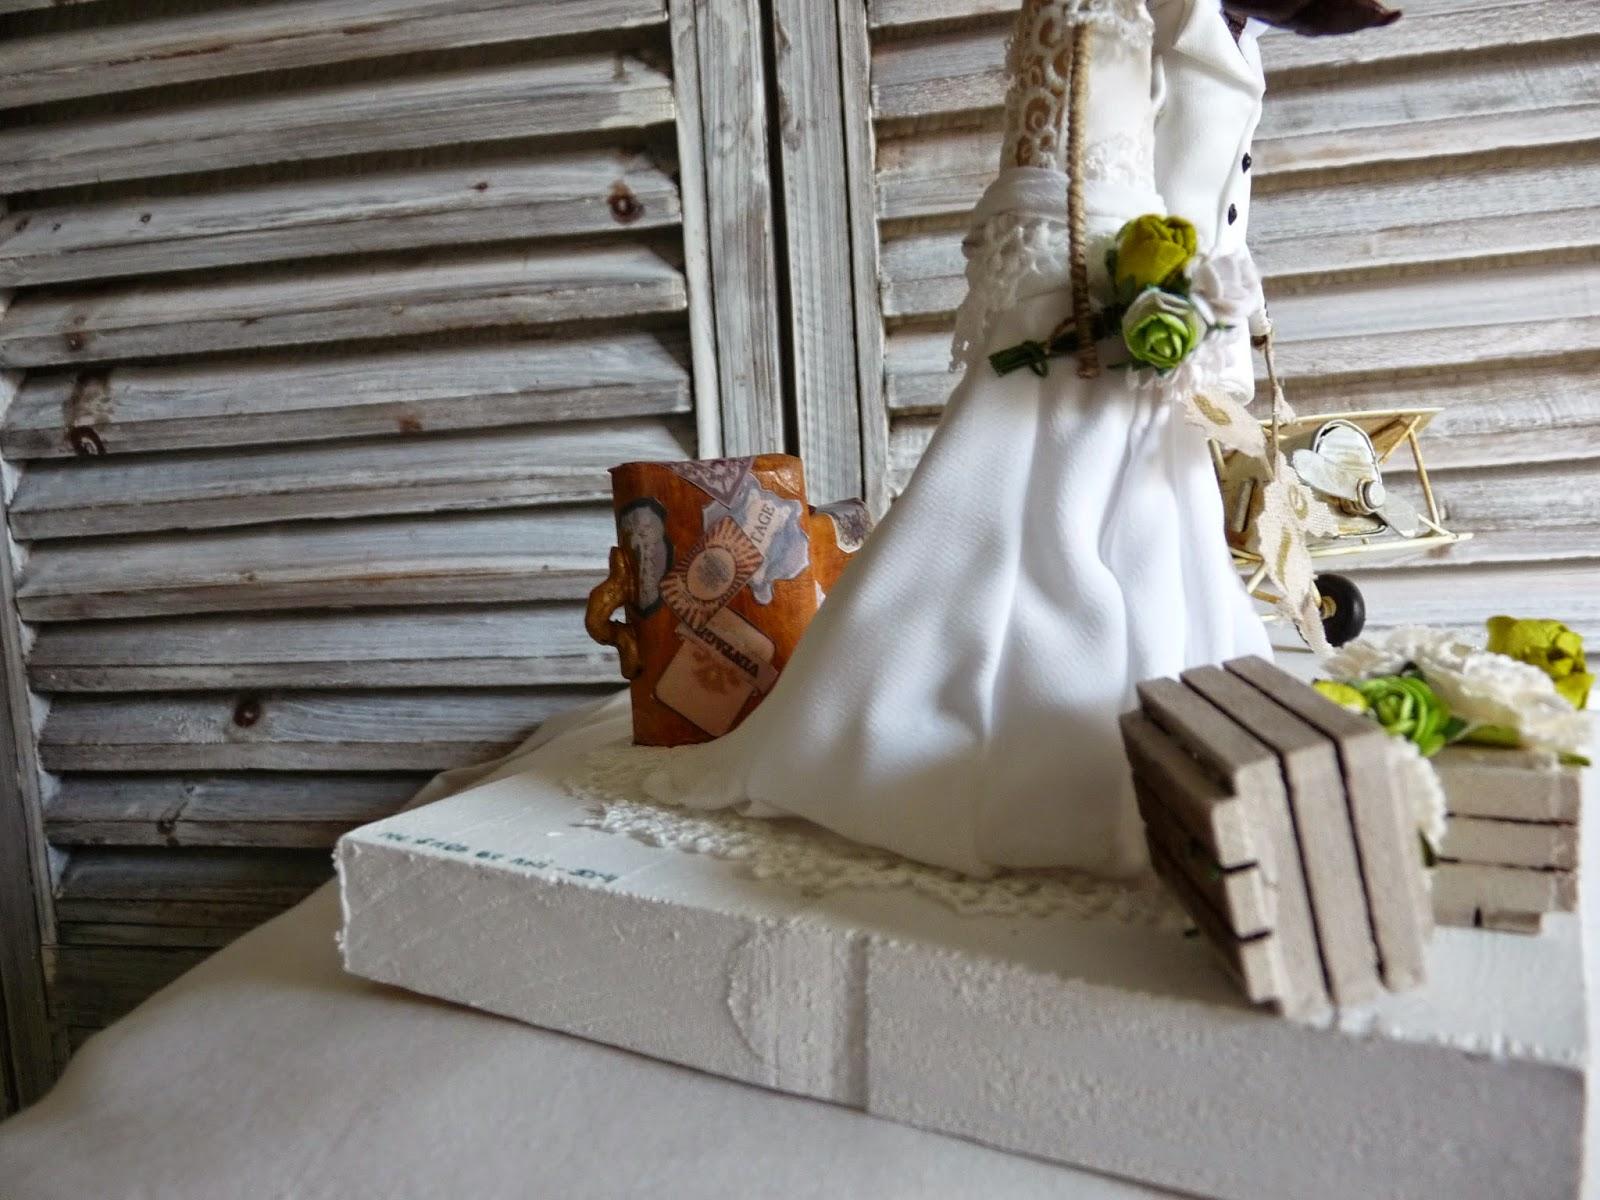 pronovias, novios pastel personalizados, figuras tarta, muñecos pastel, novios, novios originales, novios con encanto, wedding cake, topper cake, cake topper, bride,novia, novio, vestido novia, muñecos pastel personalizados, tarta boda, pastel nupcial, prometidos, nos casamos, novios de pastel elegante, con encanto, maleta, viaje de novios, ramo de novia, peinado novia, corbata novio, restaurante bodas, mrymrsbyani, mr&mrsbyani, wedding topper cake, jordi anguera novias